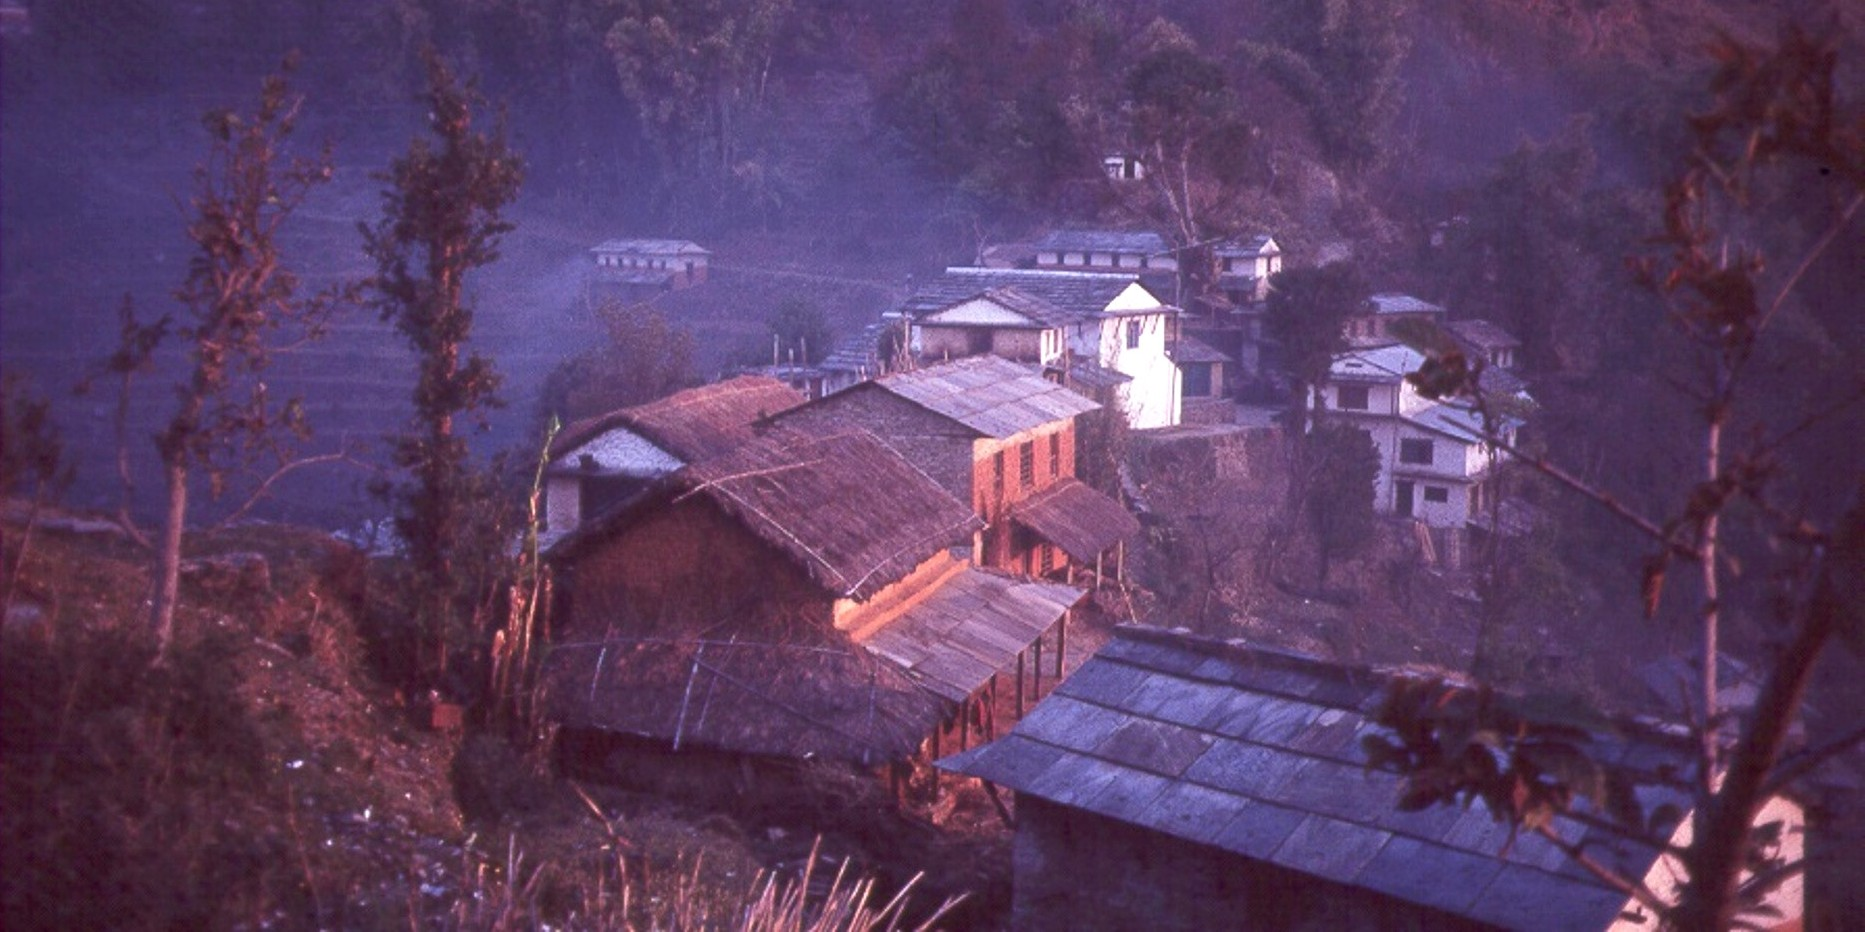 deopur-at-dusk-1875x1250